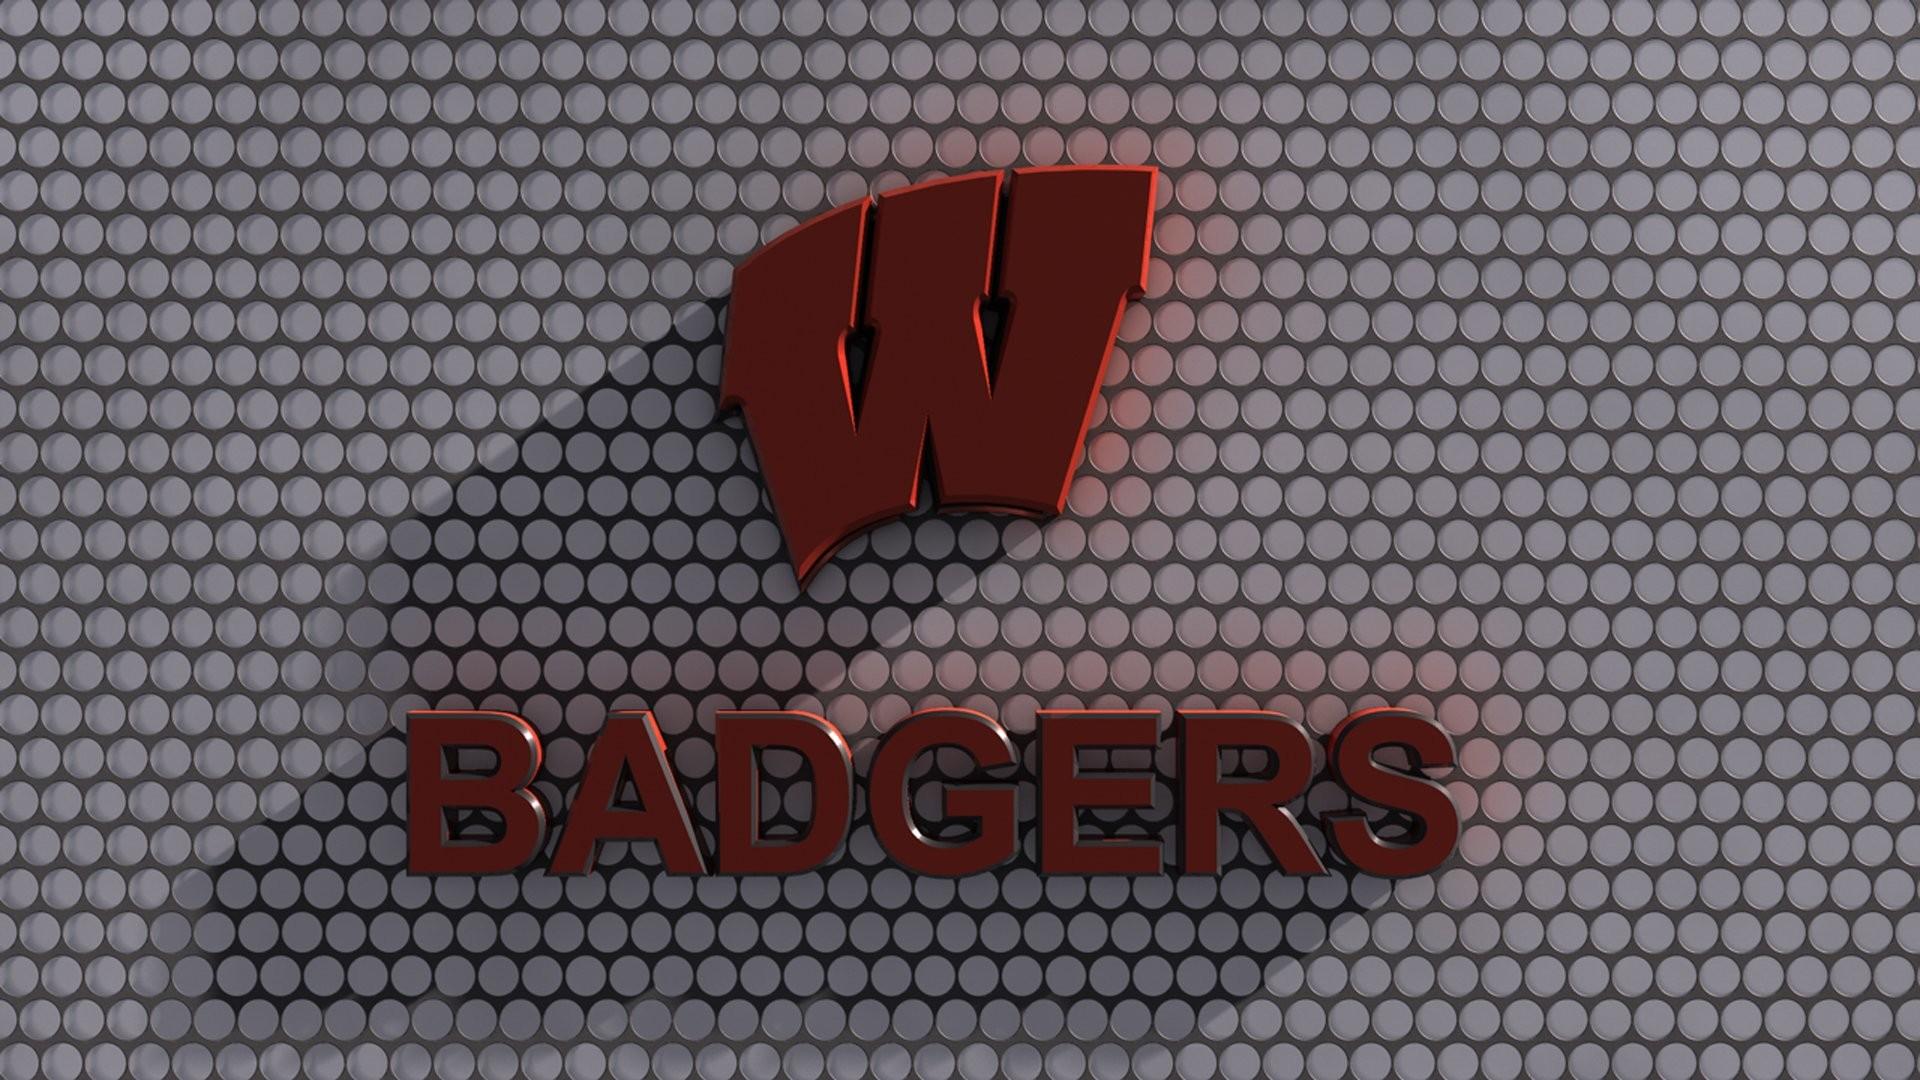 WISCONSIN BADGERS college football wallpaper | | 594010 |  WallpaperUP